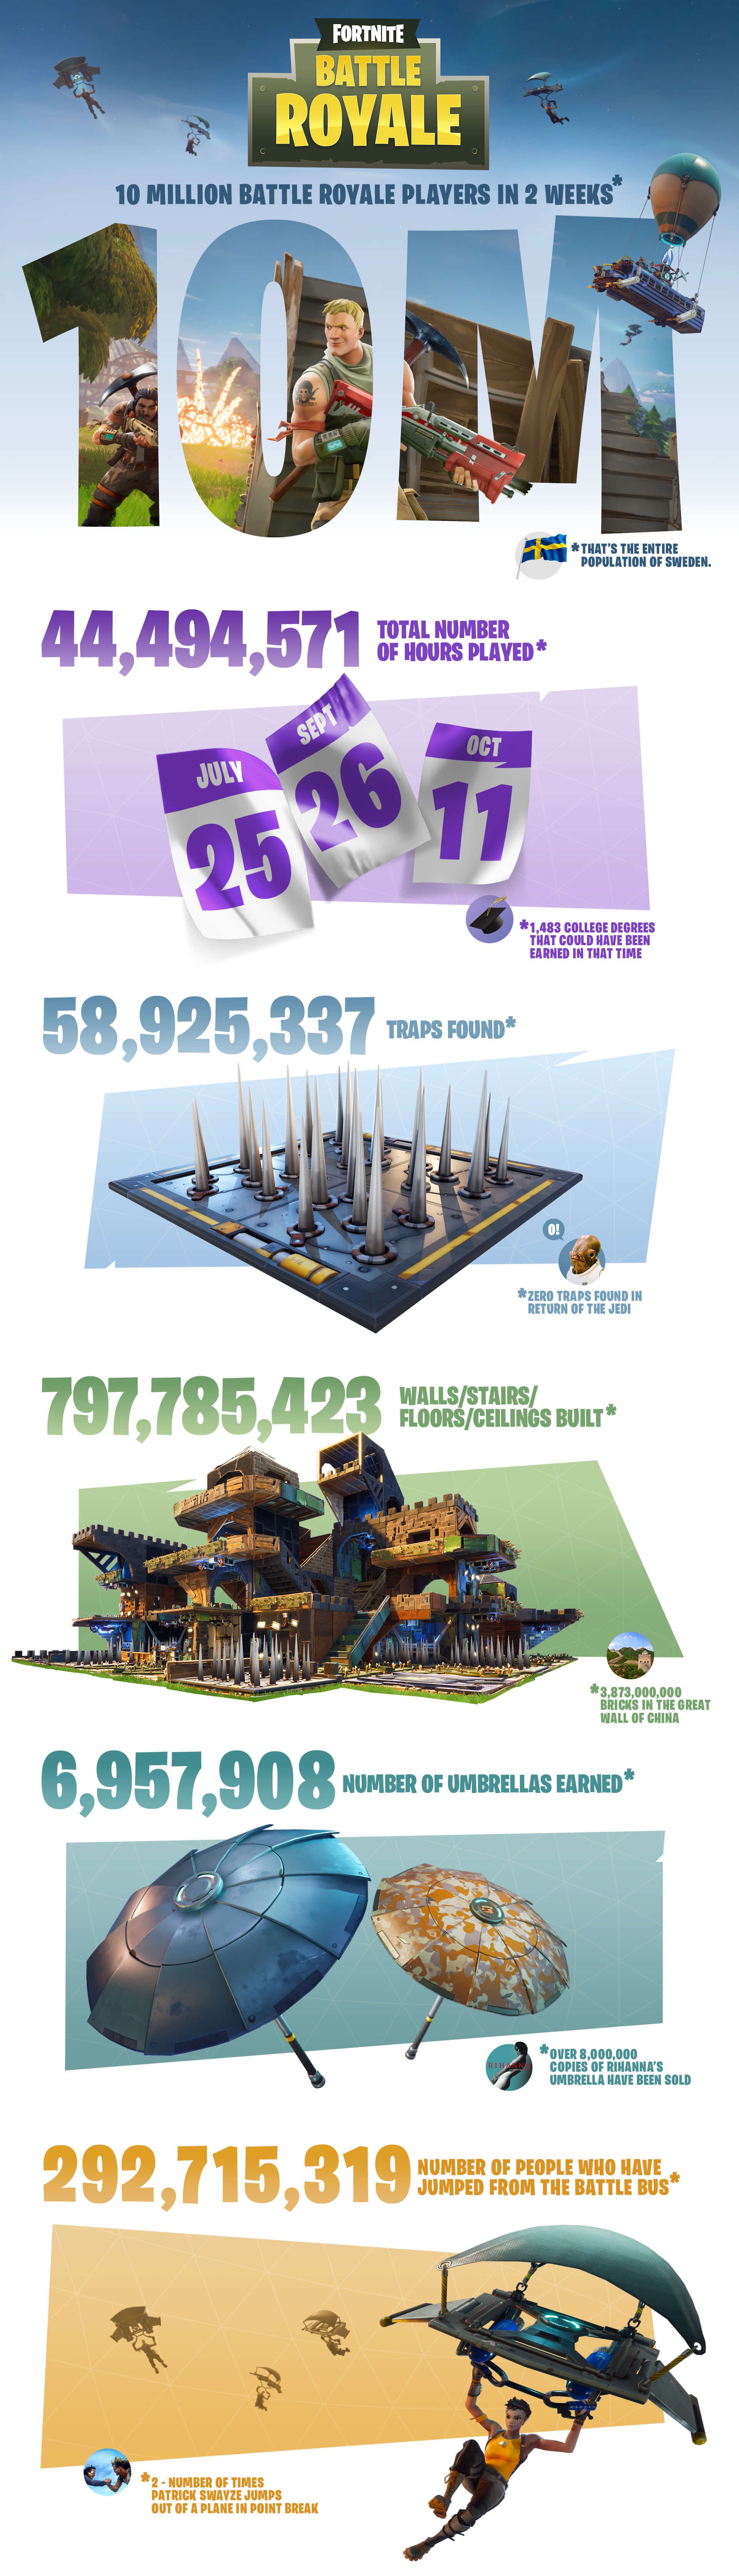 Fortnite Battle Royale Surpasses 10 Million Players In